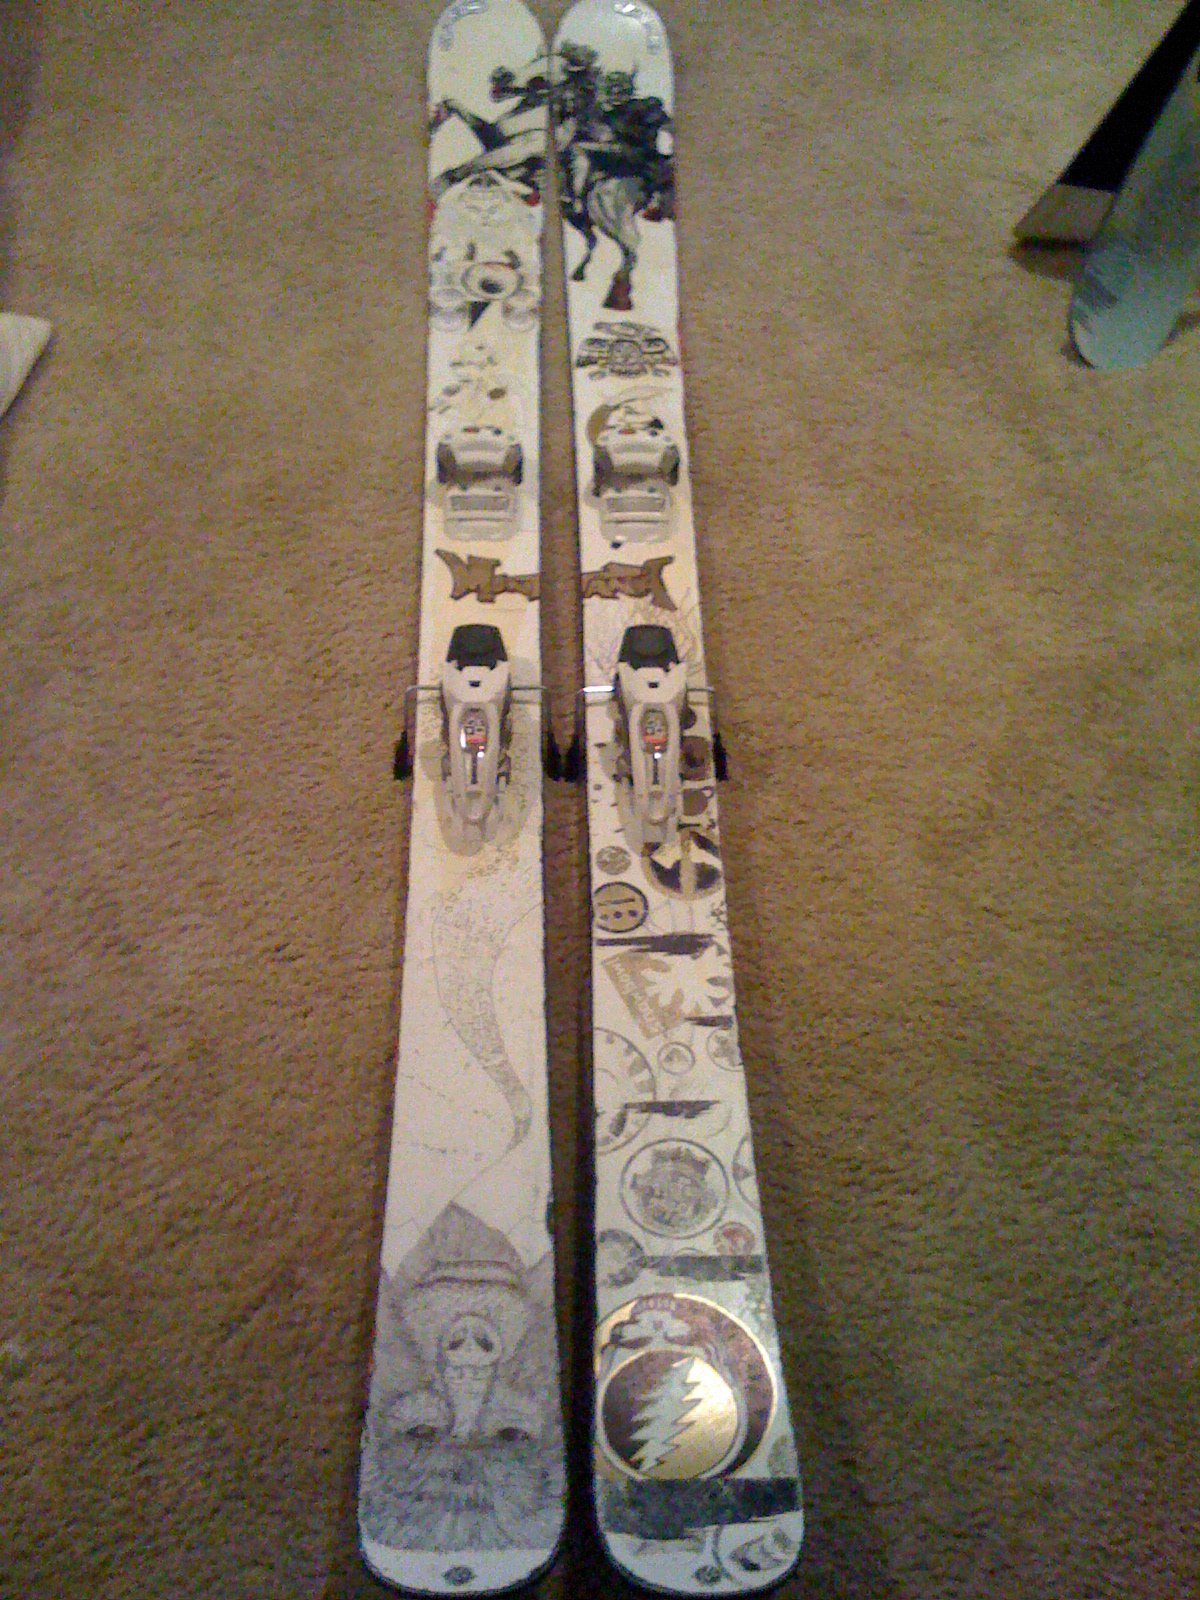 190cm K2 Hellbents with Marker Griffon bindings, custom